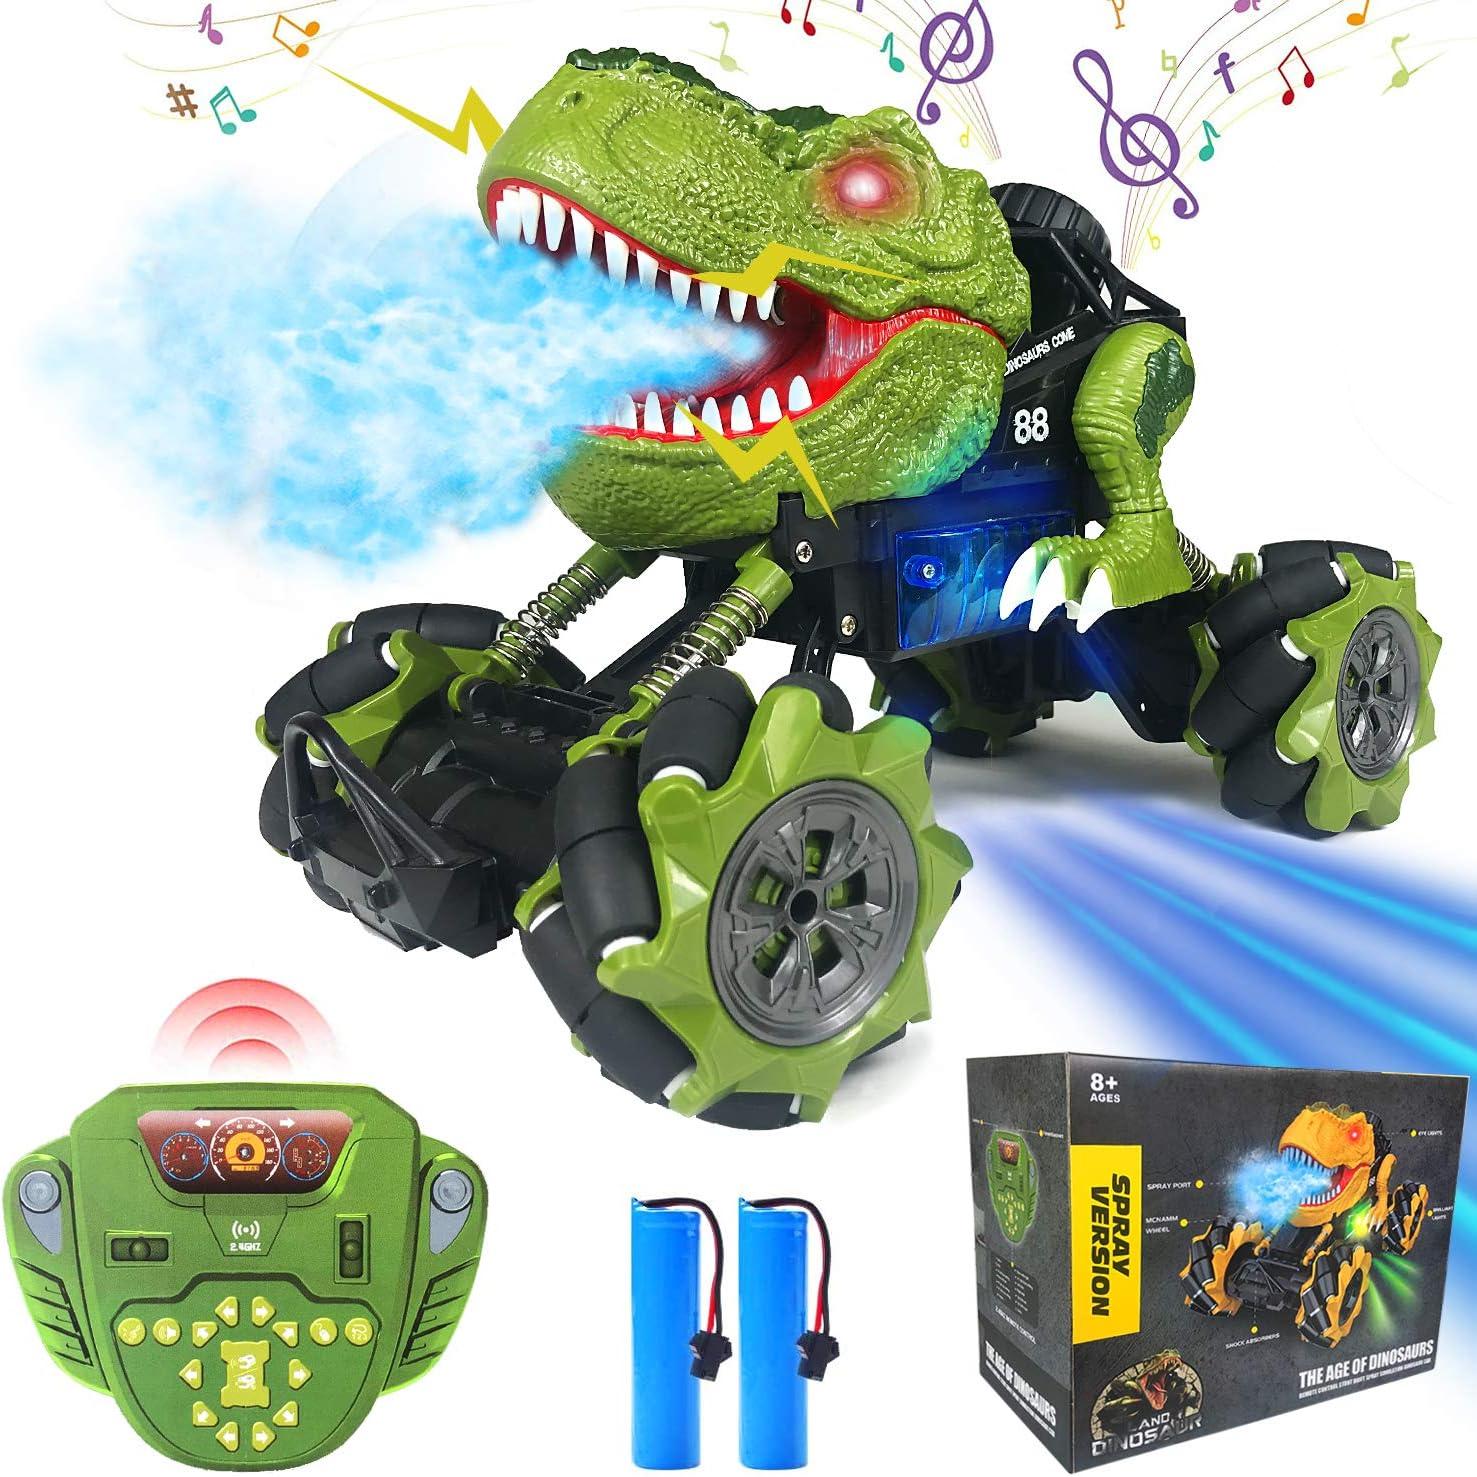 Remote Control Dinosaur Ranking integrated 1st place Car RC T-Rex Super-cheap Drift Inch Powerful Tru 11